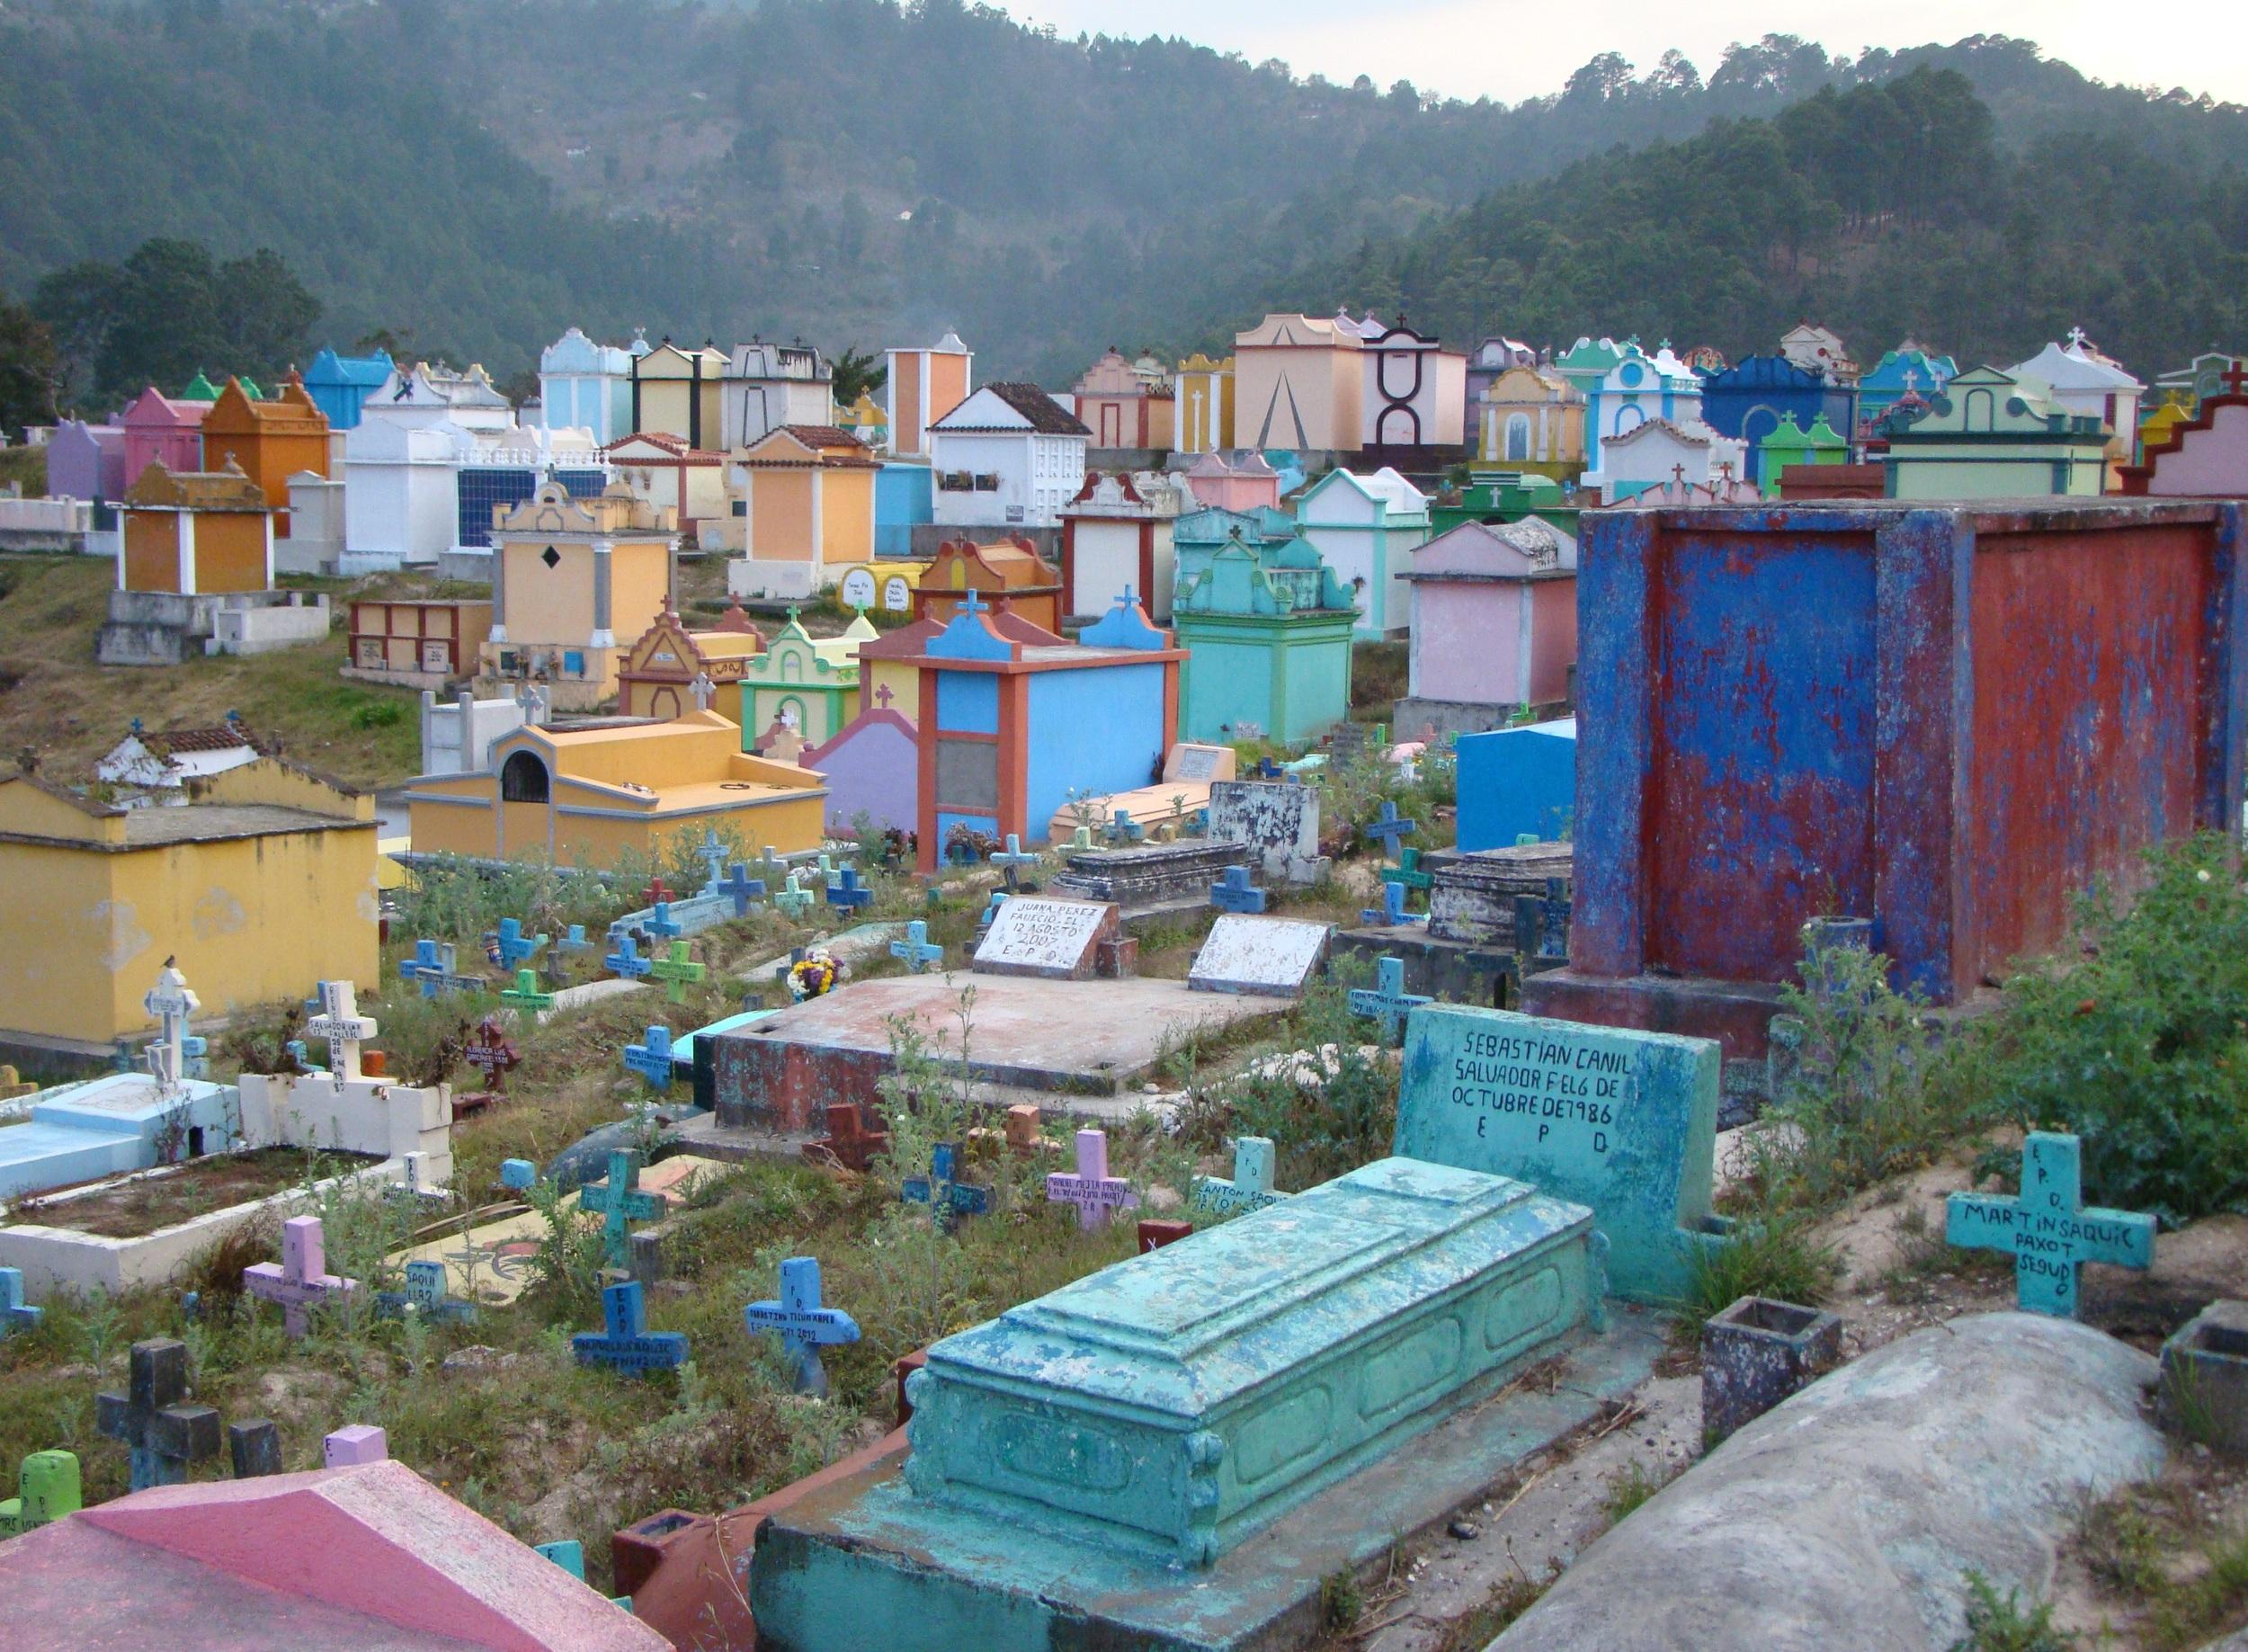 Cemetery in Chichicastenango, Guatemala. 2014.